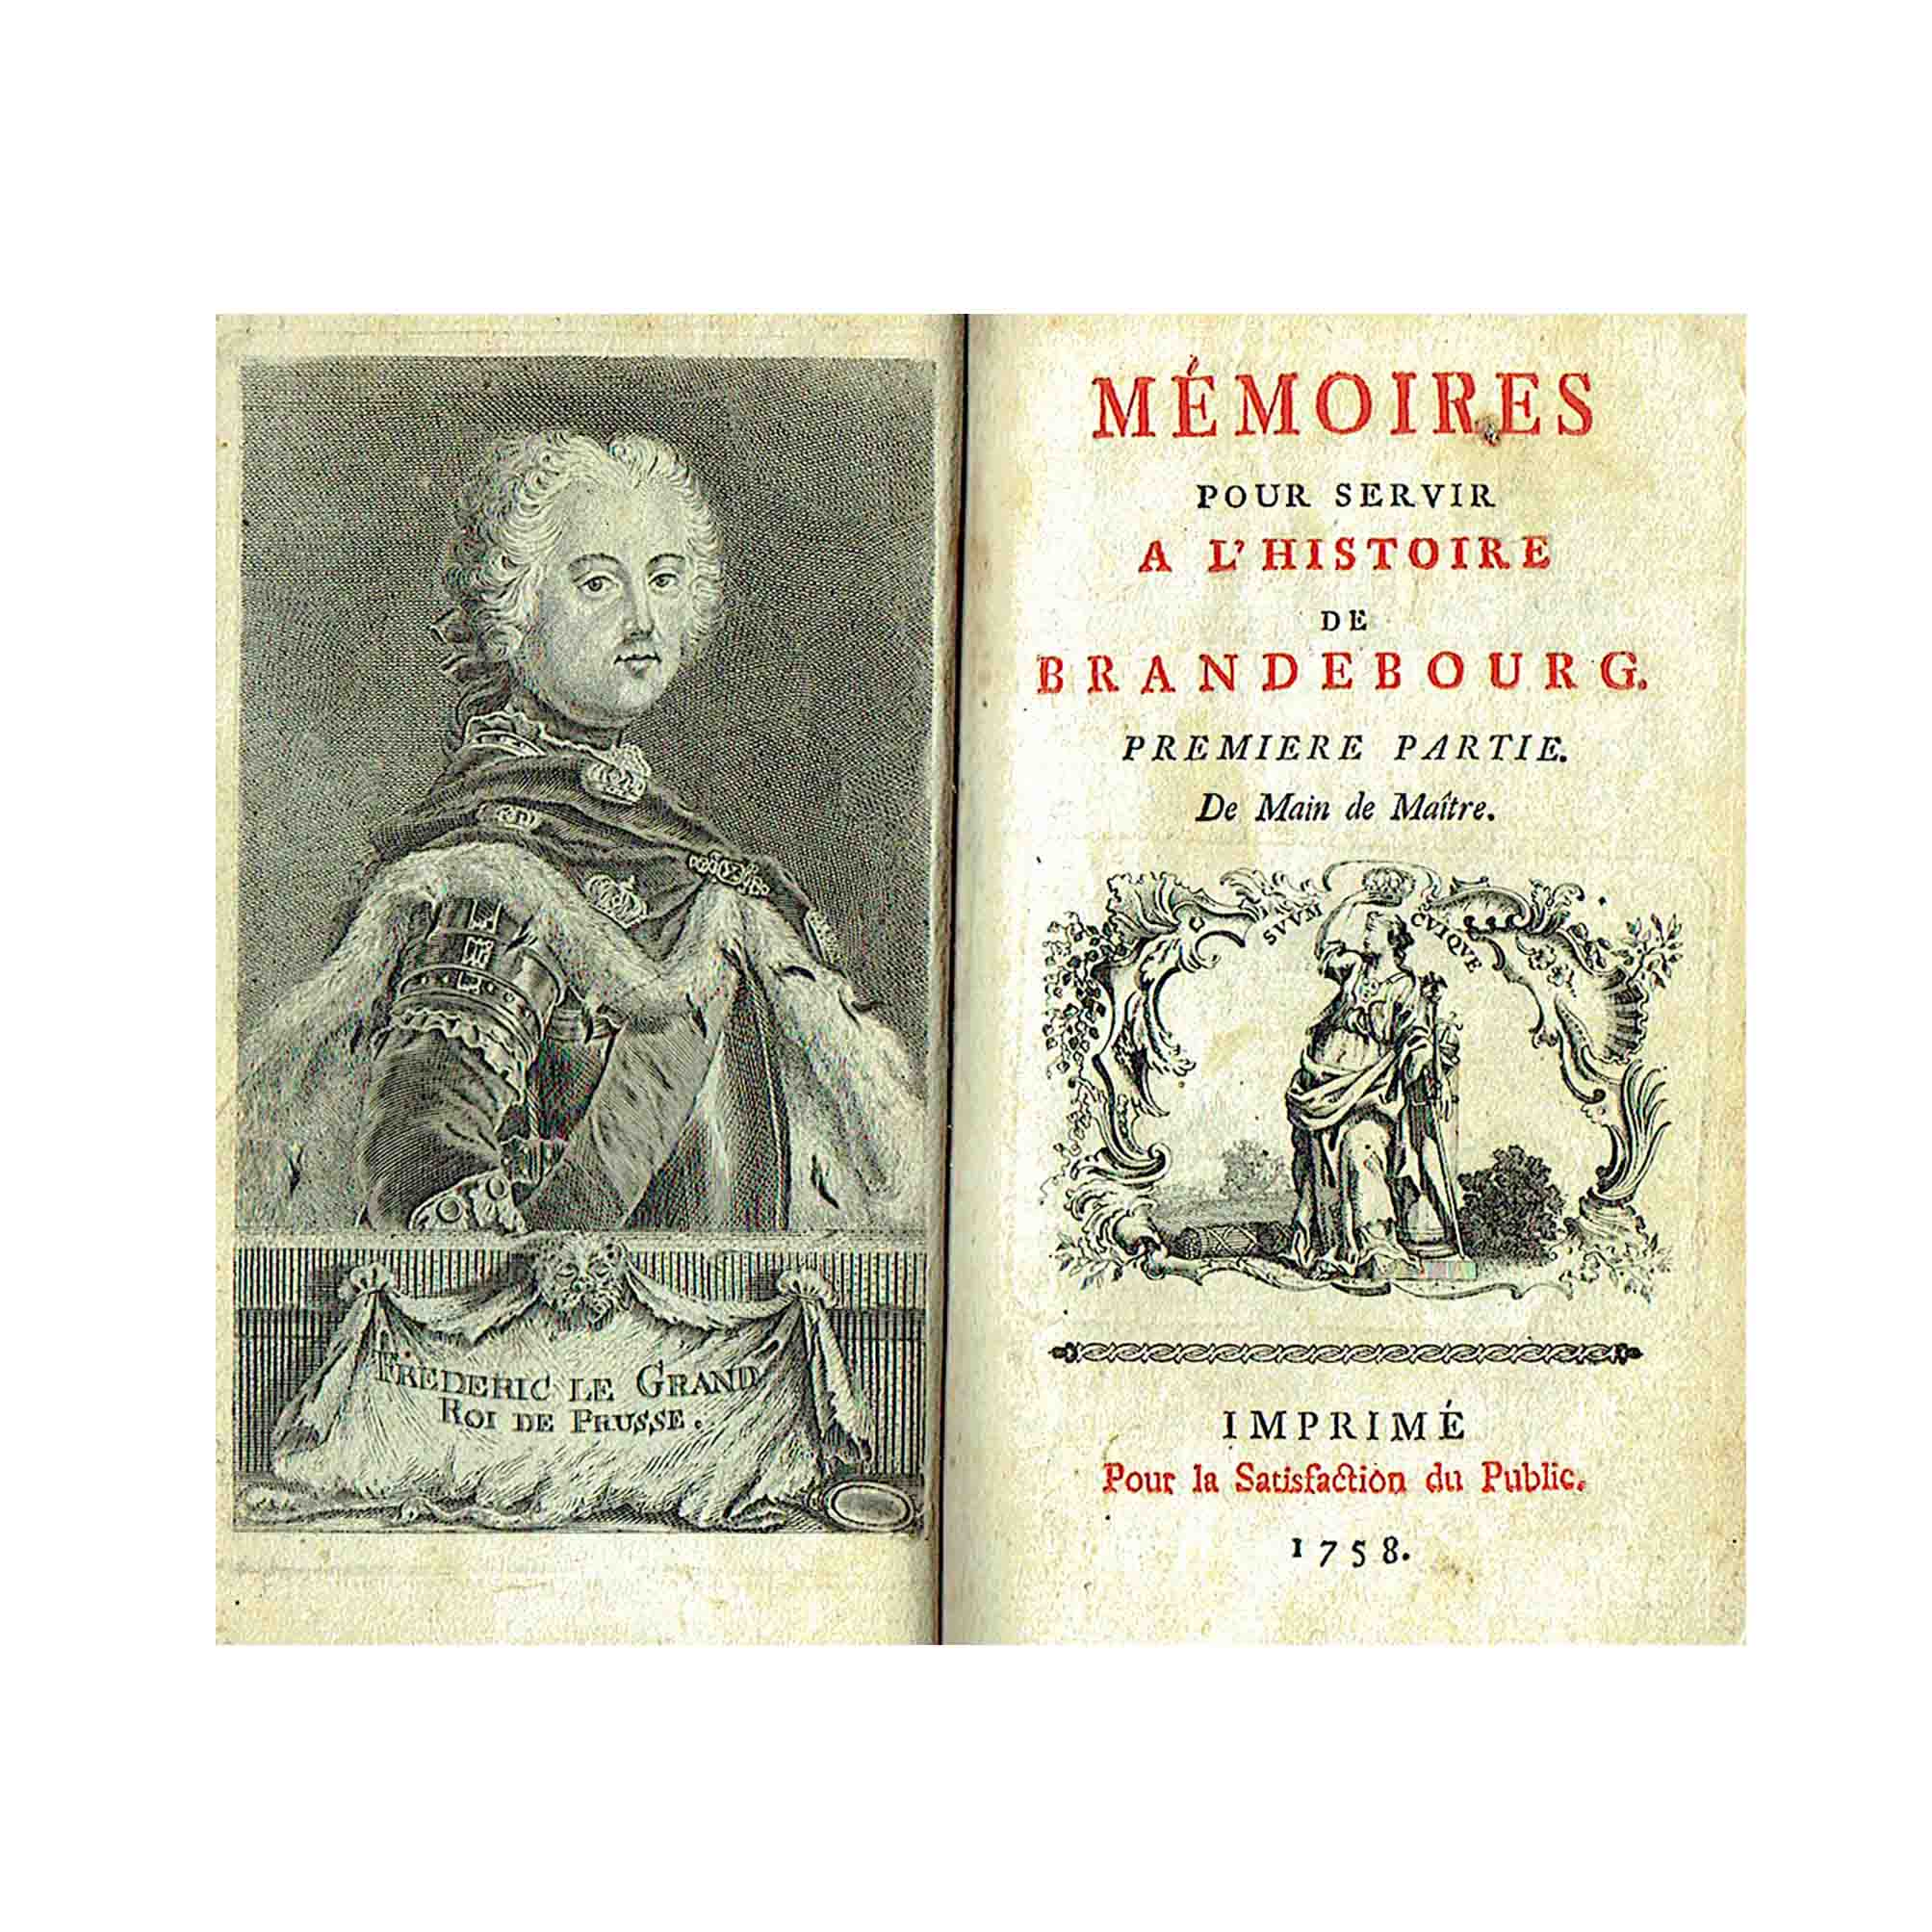 5592-Friedrich-II-Mémoires-Brandenbourg-1758-Titel-Frontispiz-Friedrich-A-N.jpg